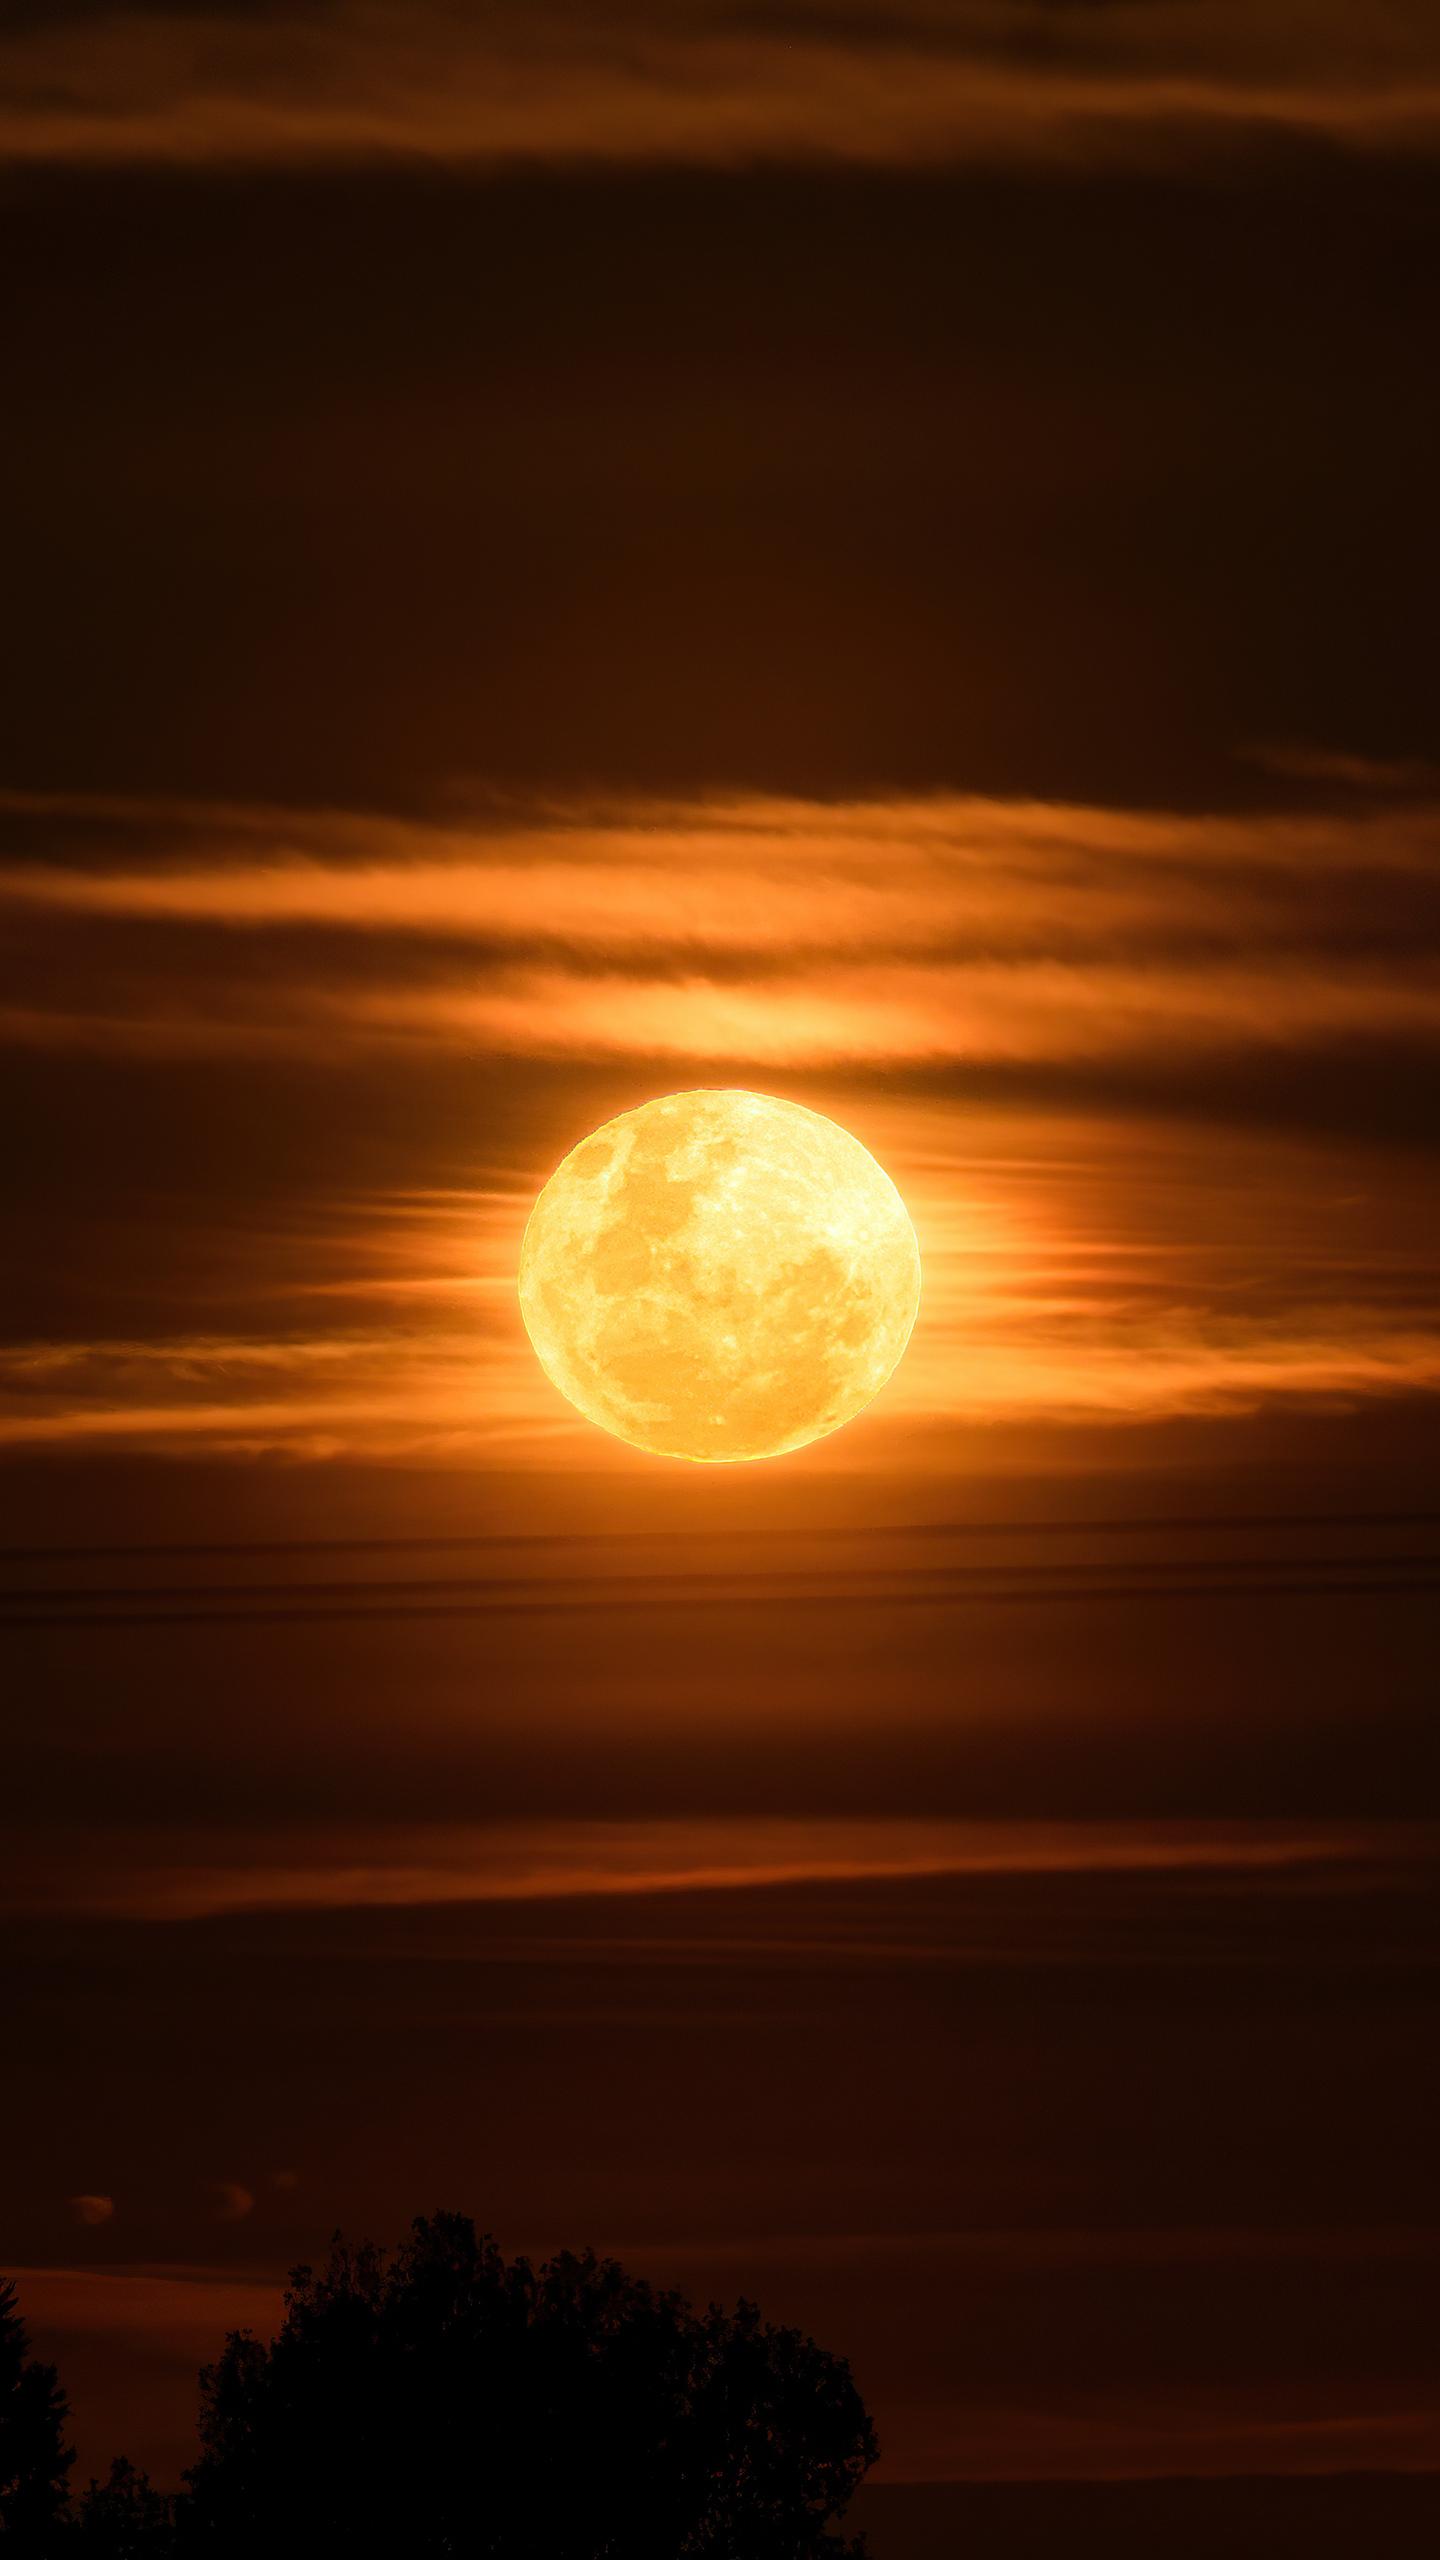 super-moon-4k-8t.jpg